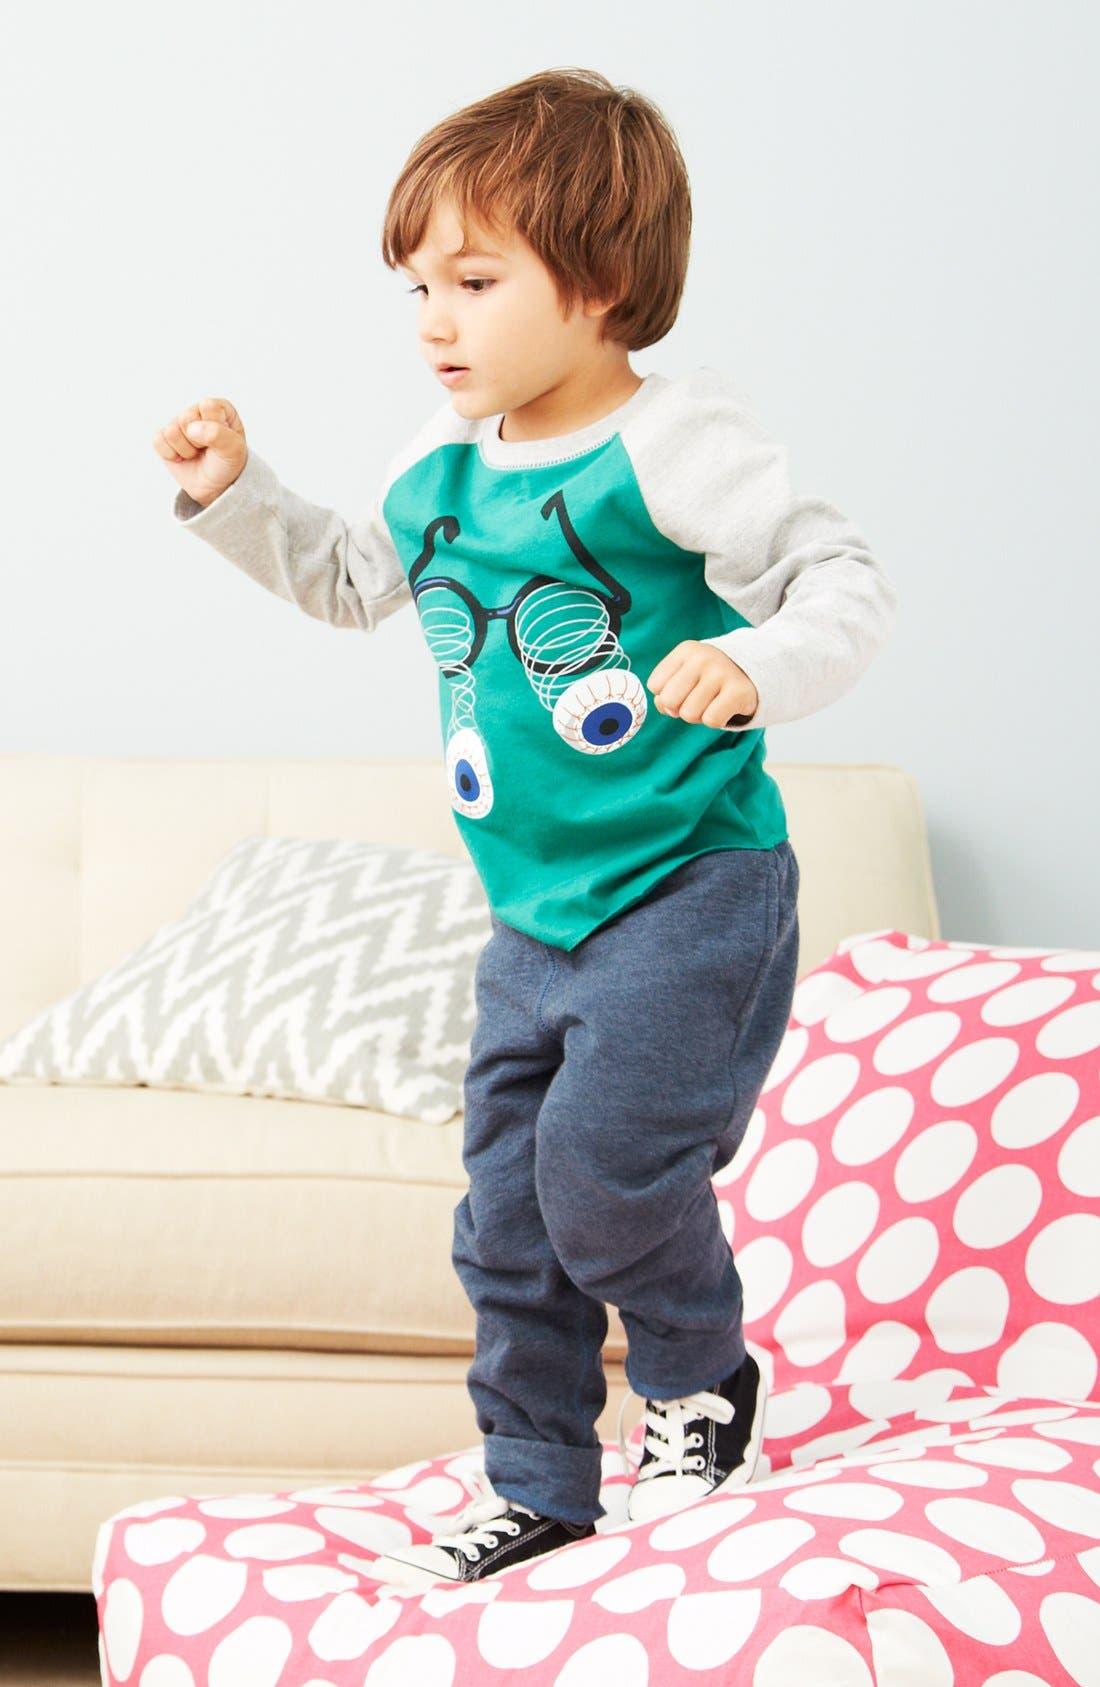 Alternate Image 1 Selected - Tucker + Tate T-Shirt & Sweatpants (Toddler Boys)